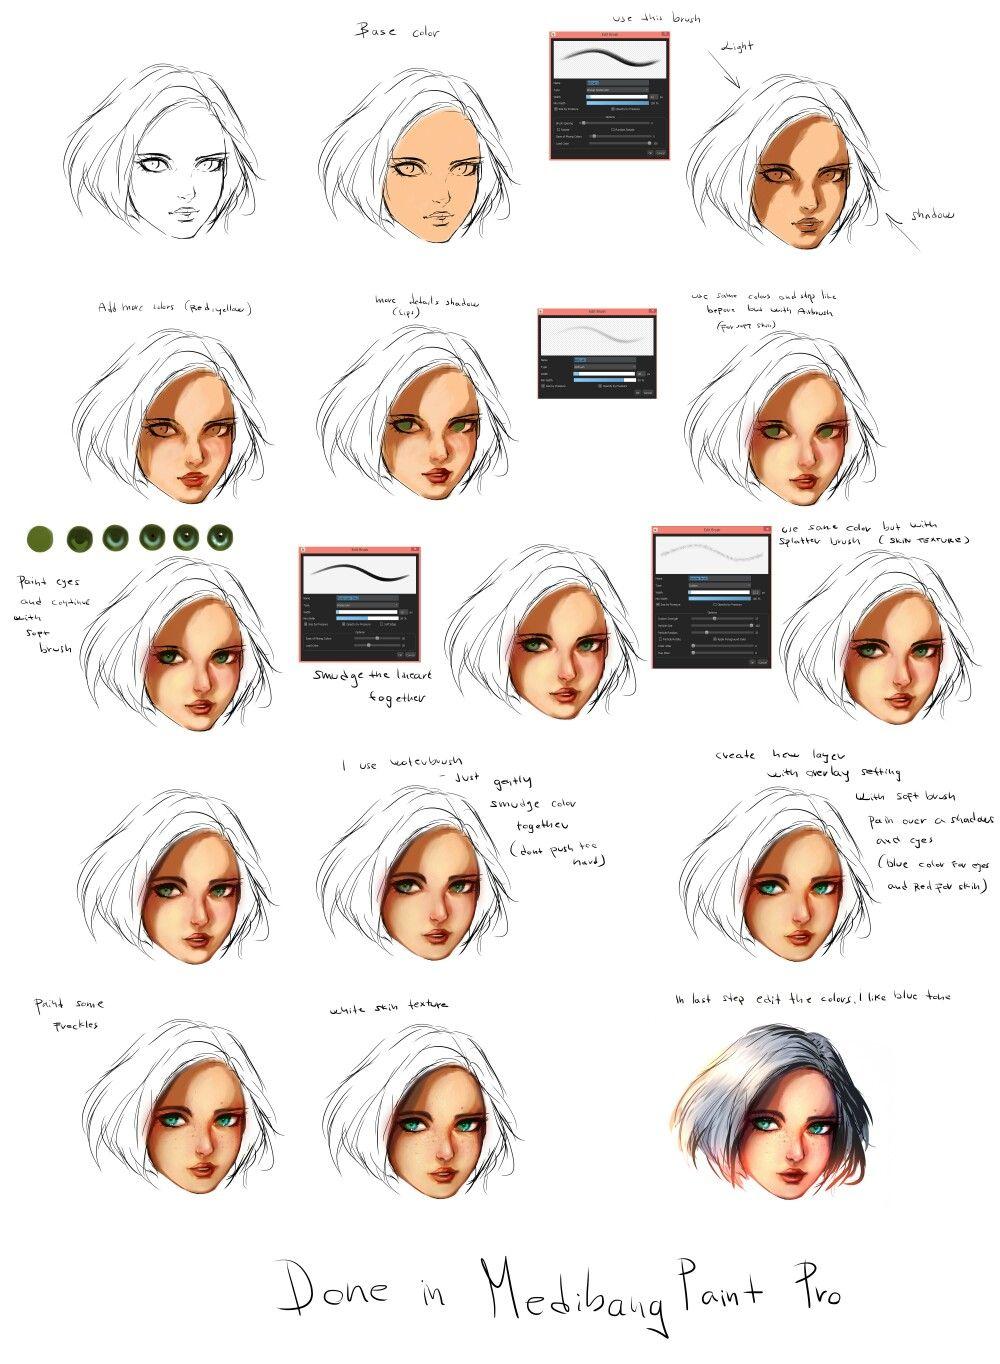 How to paint reallistic skin in medibang | art tuts | Digital ...